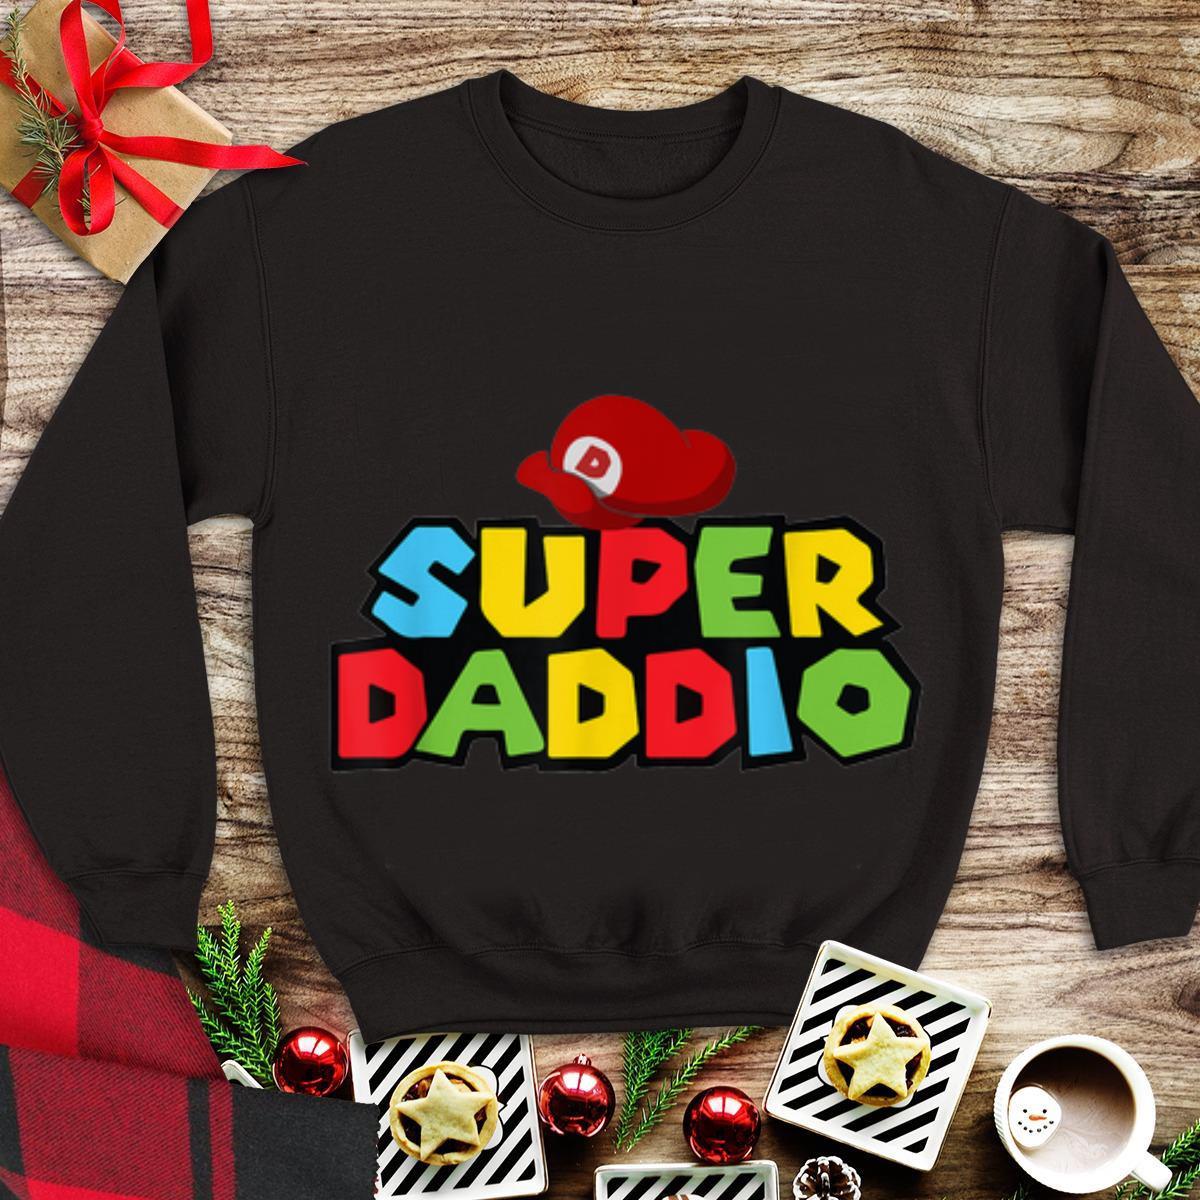 Awesome Super Daddio shirt